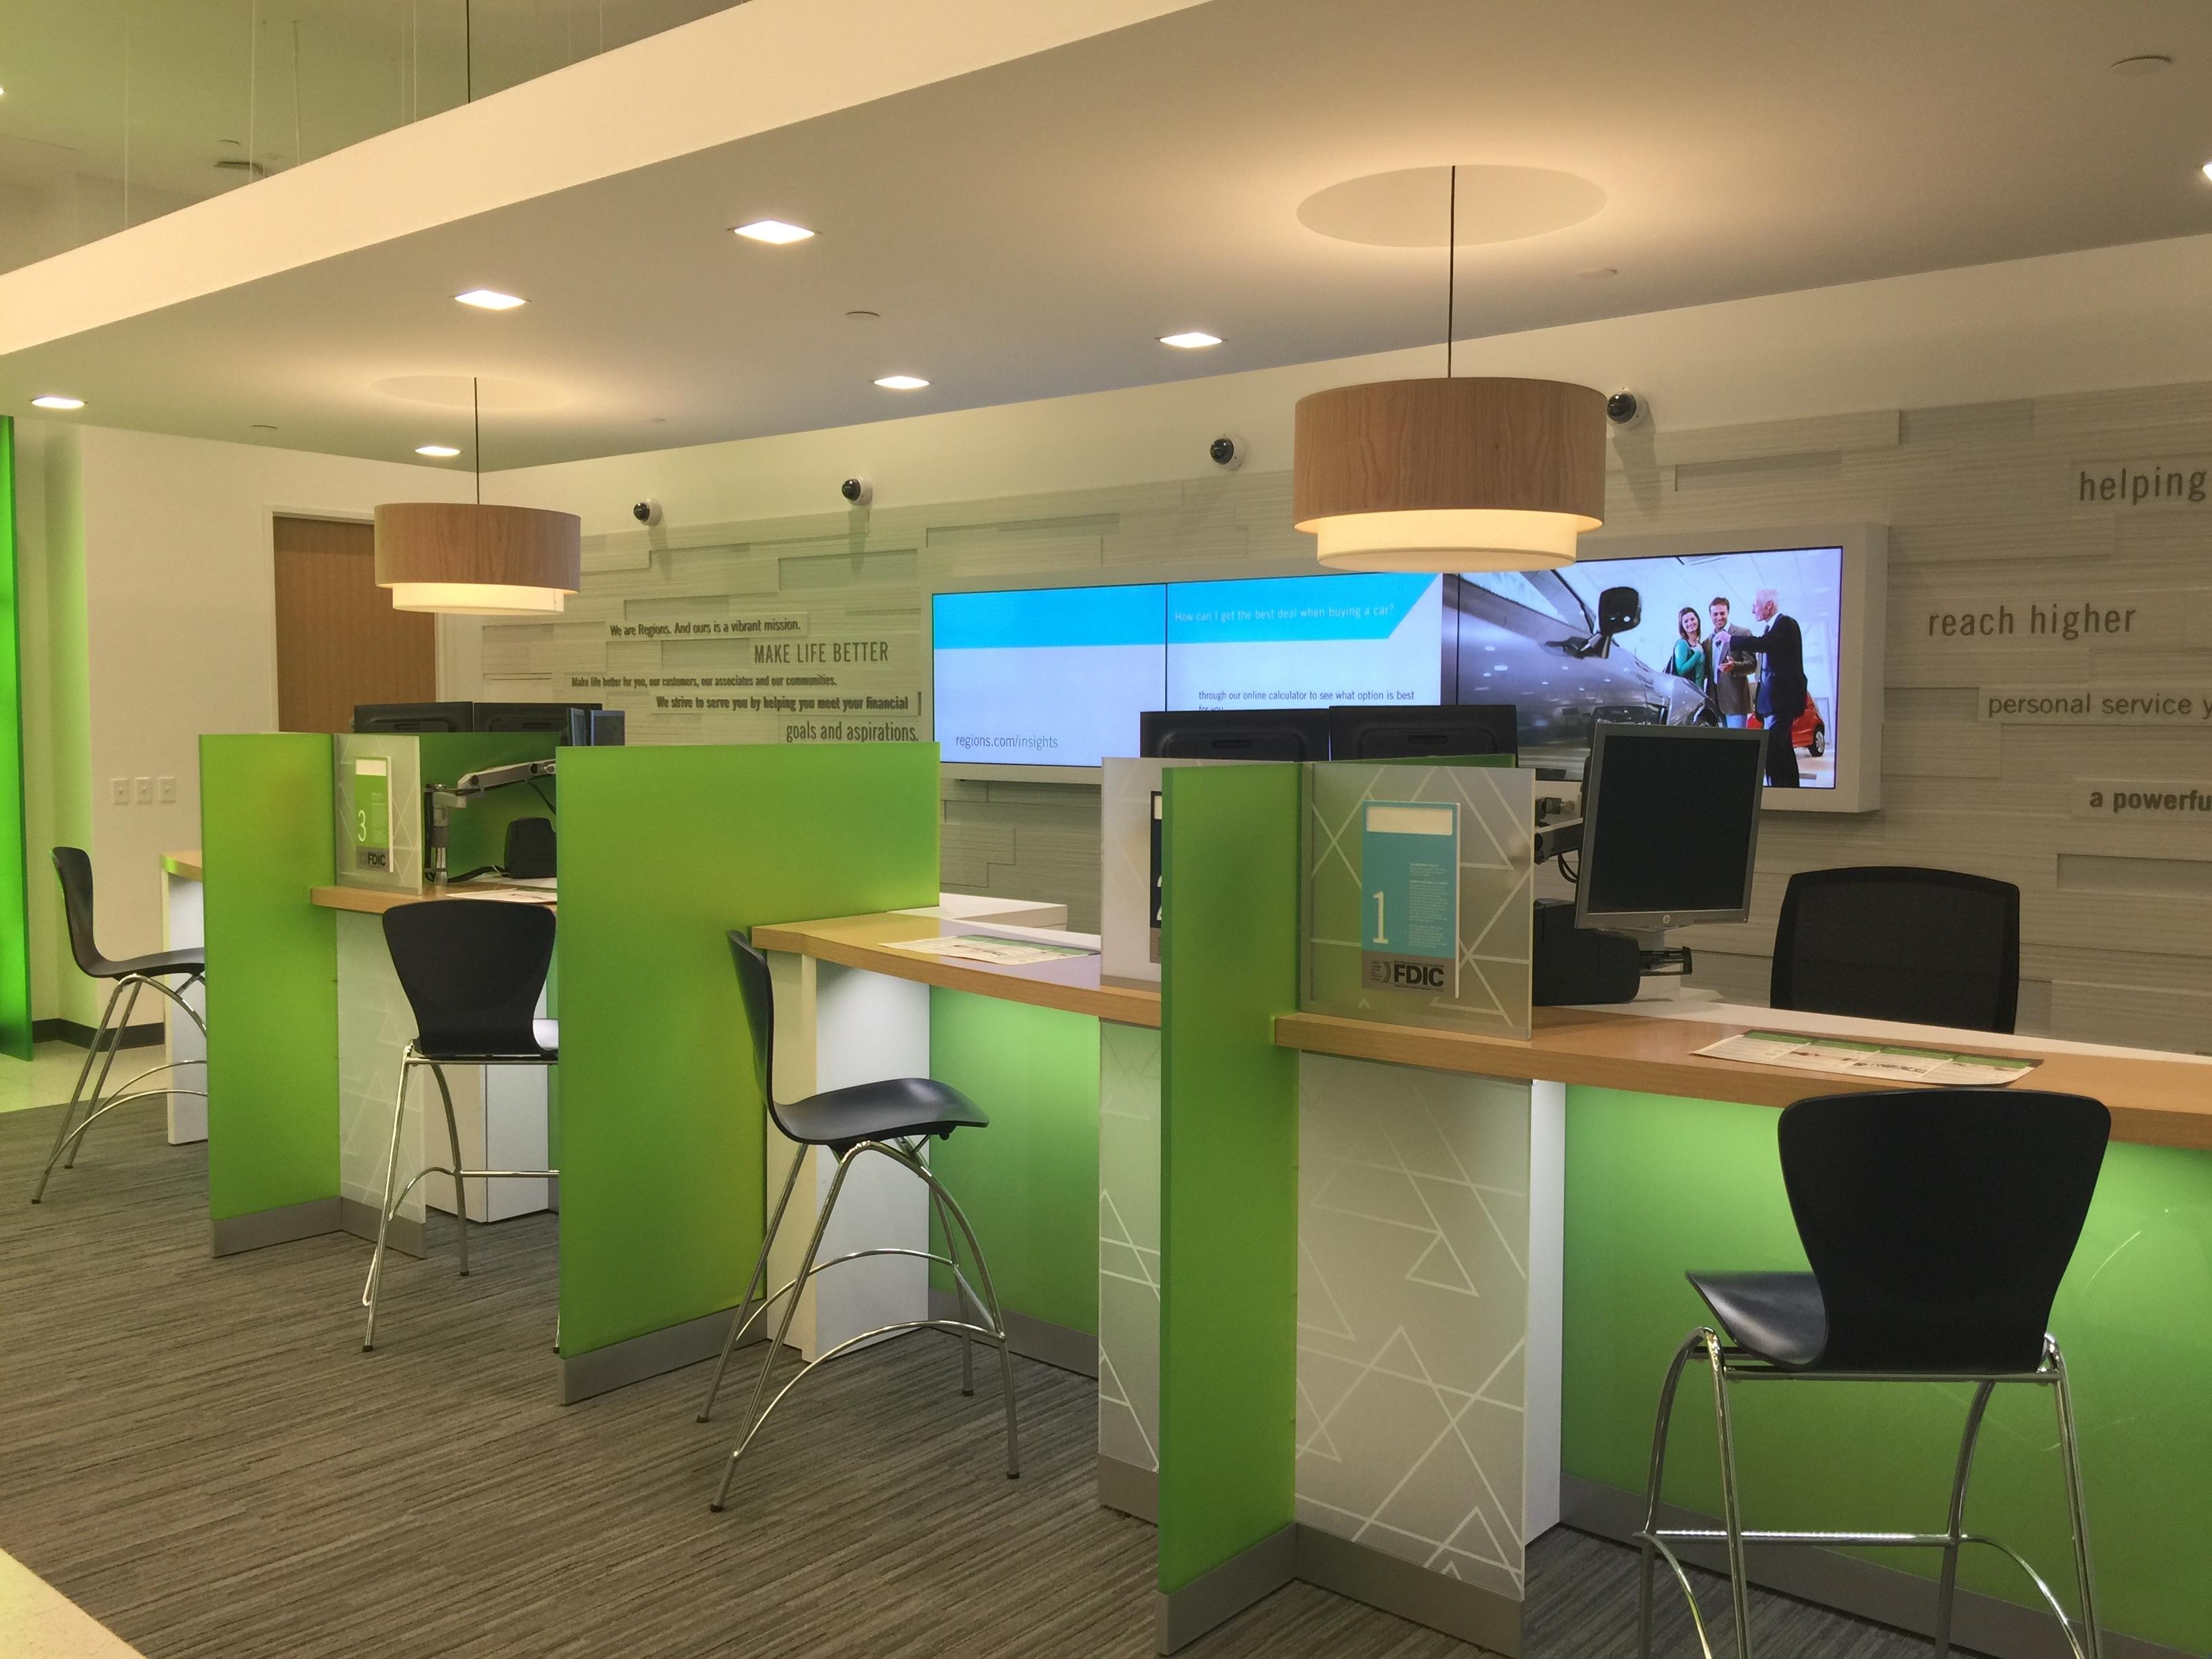 Sensational Birmingham Main 21 Regions Universal Banking Area 4 Retail Home Interior And Landscaping Ologienasavecom